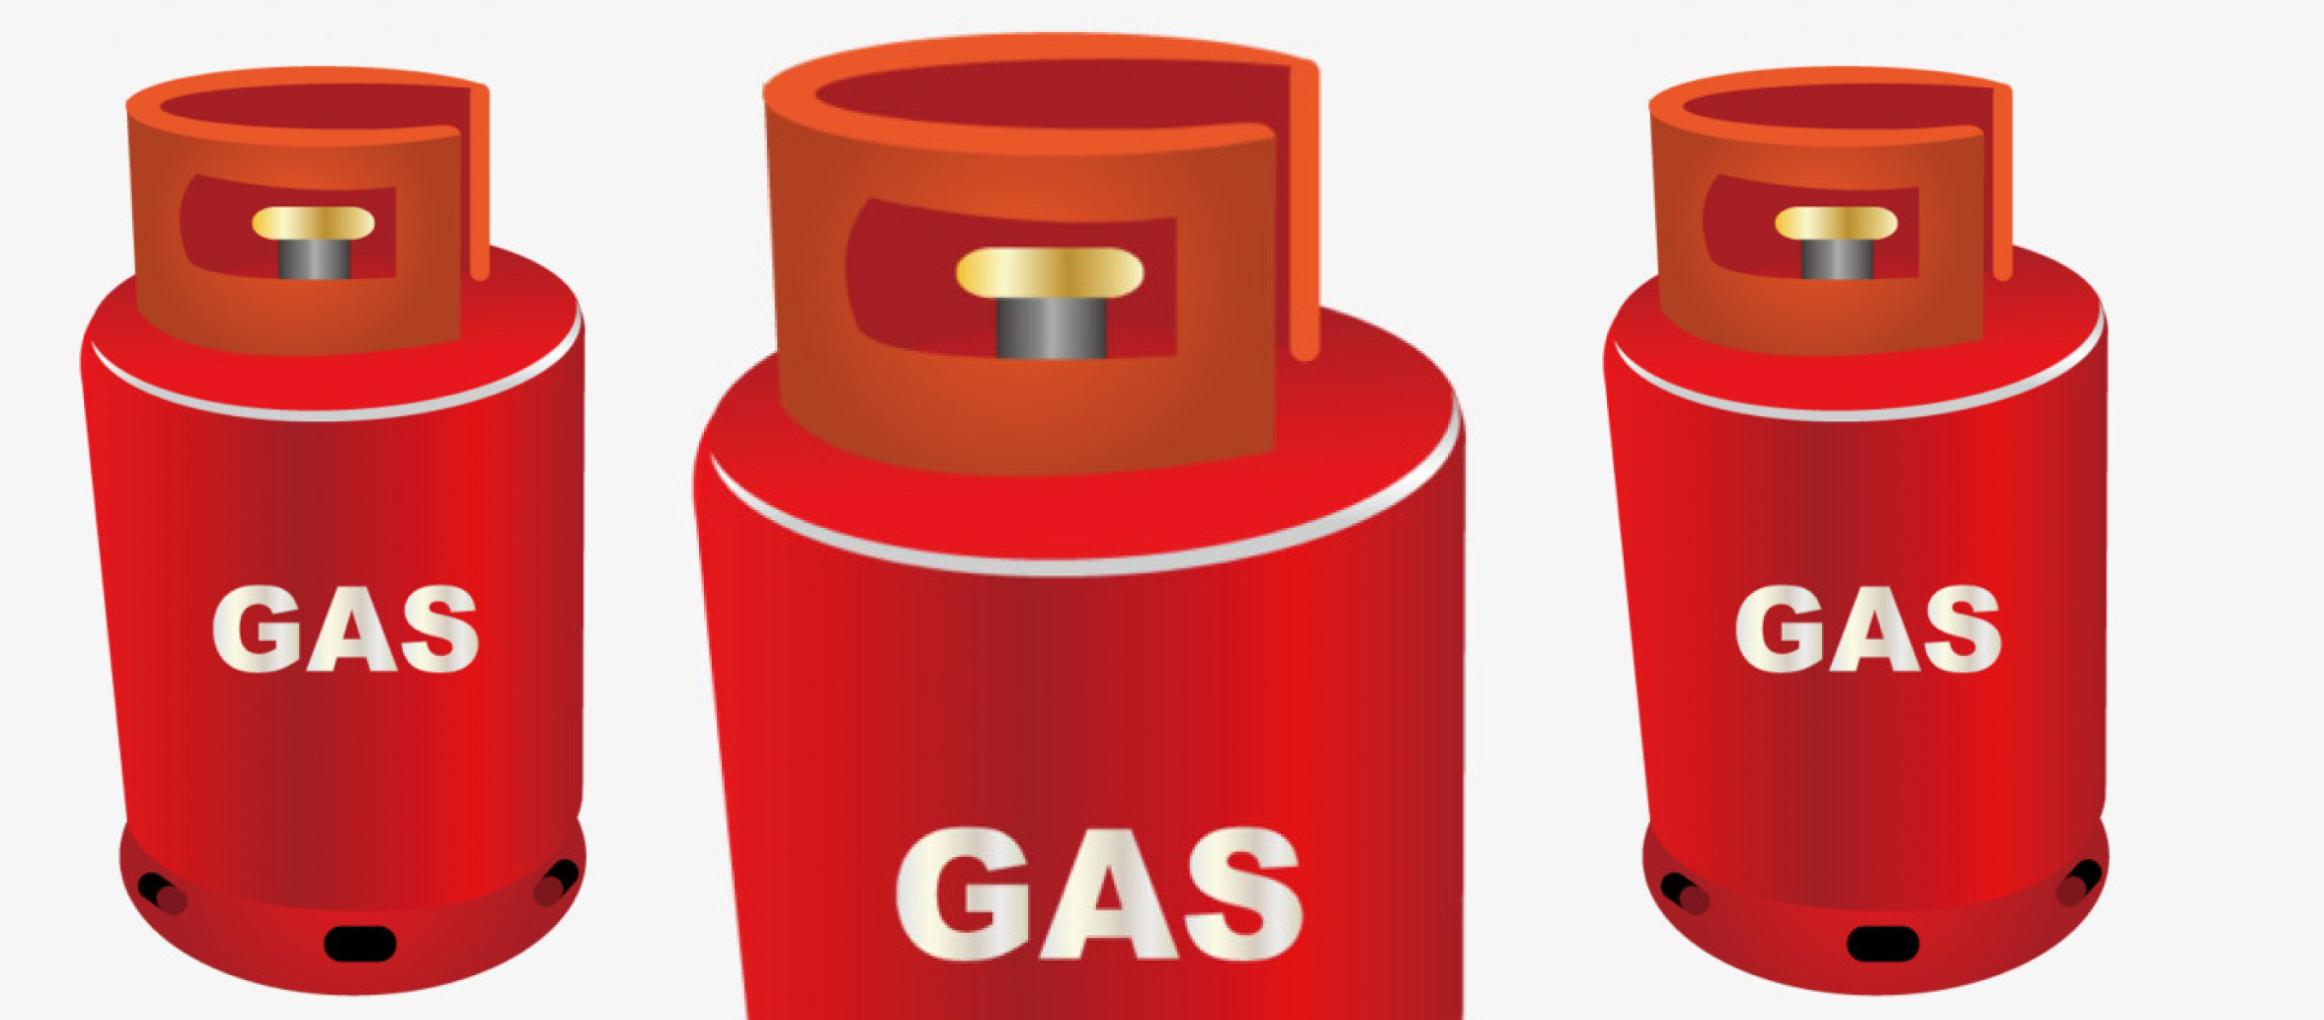 Acordo de Gás